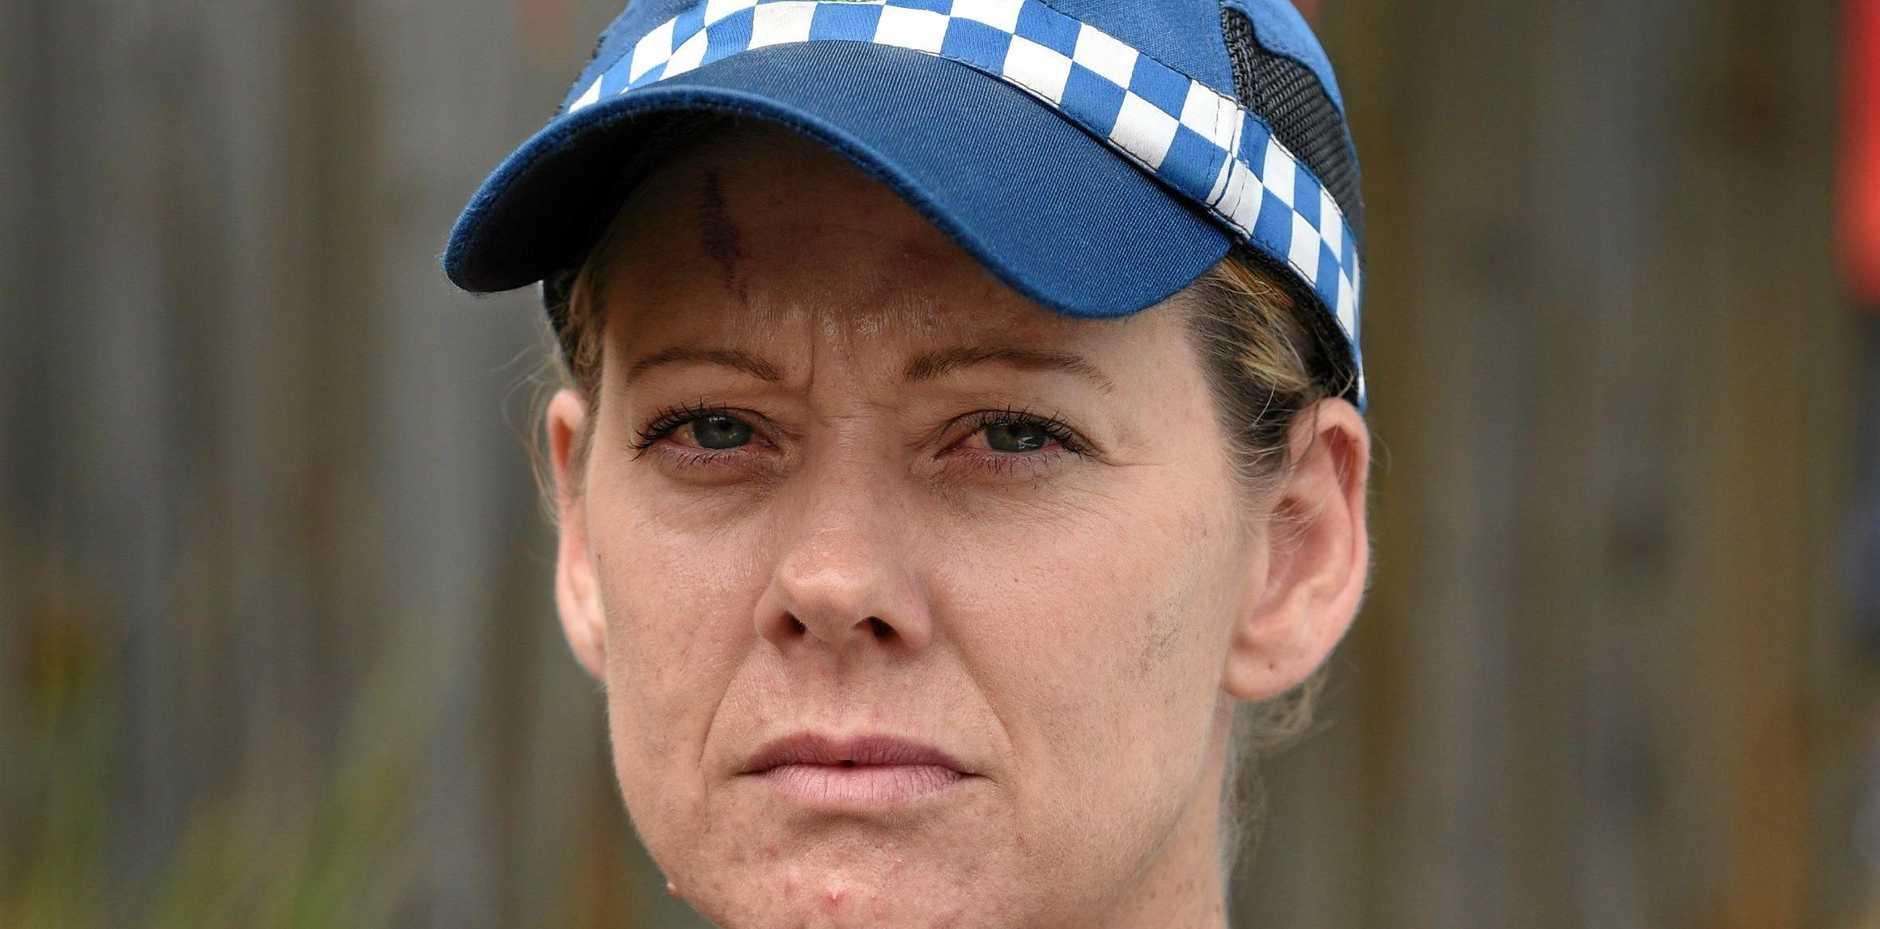 WE CAN HELP: Senior Constable Leigh Nancarrow at Hervey Bay Police Station.